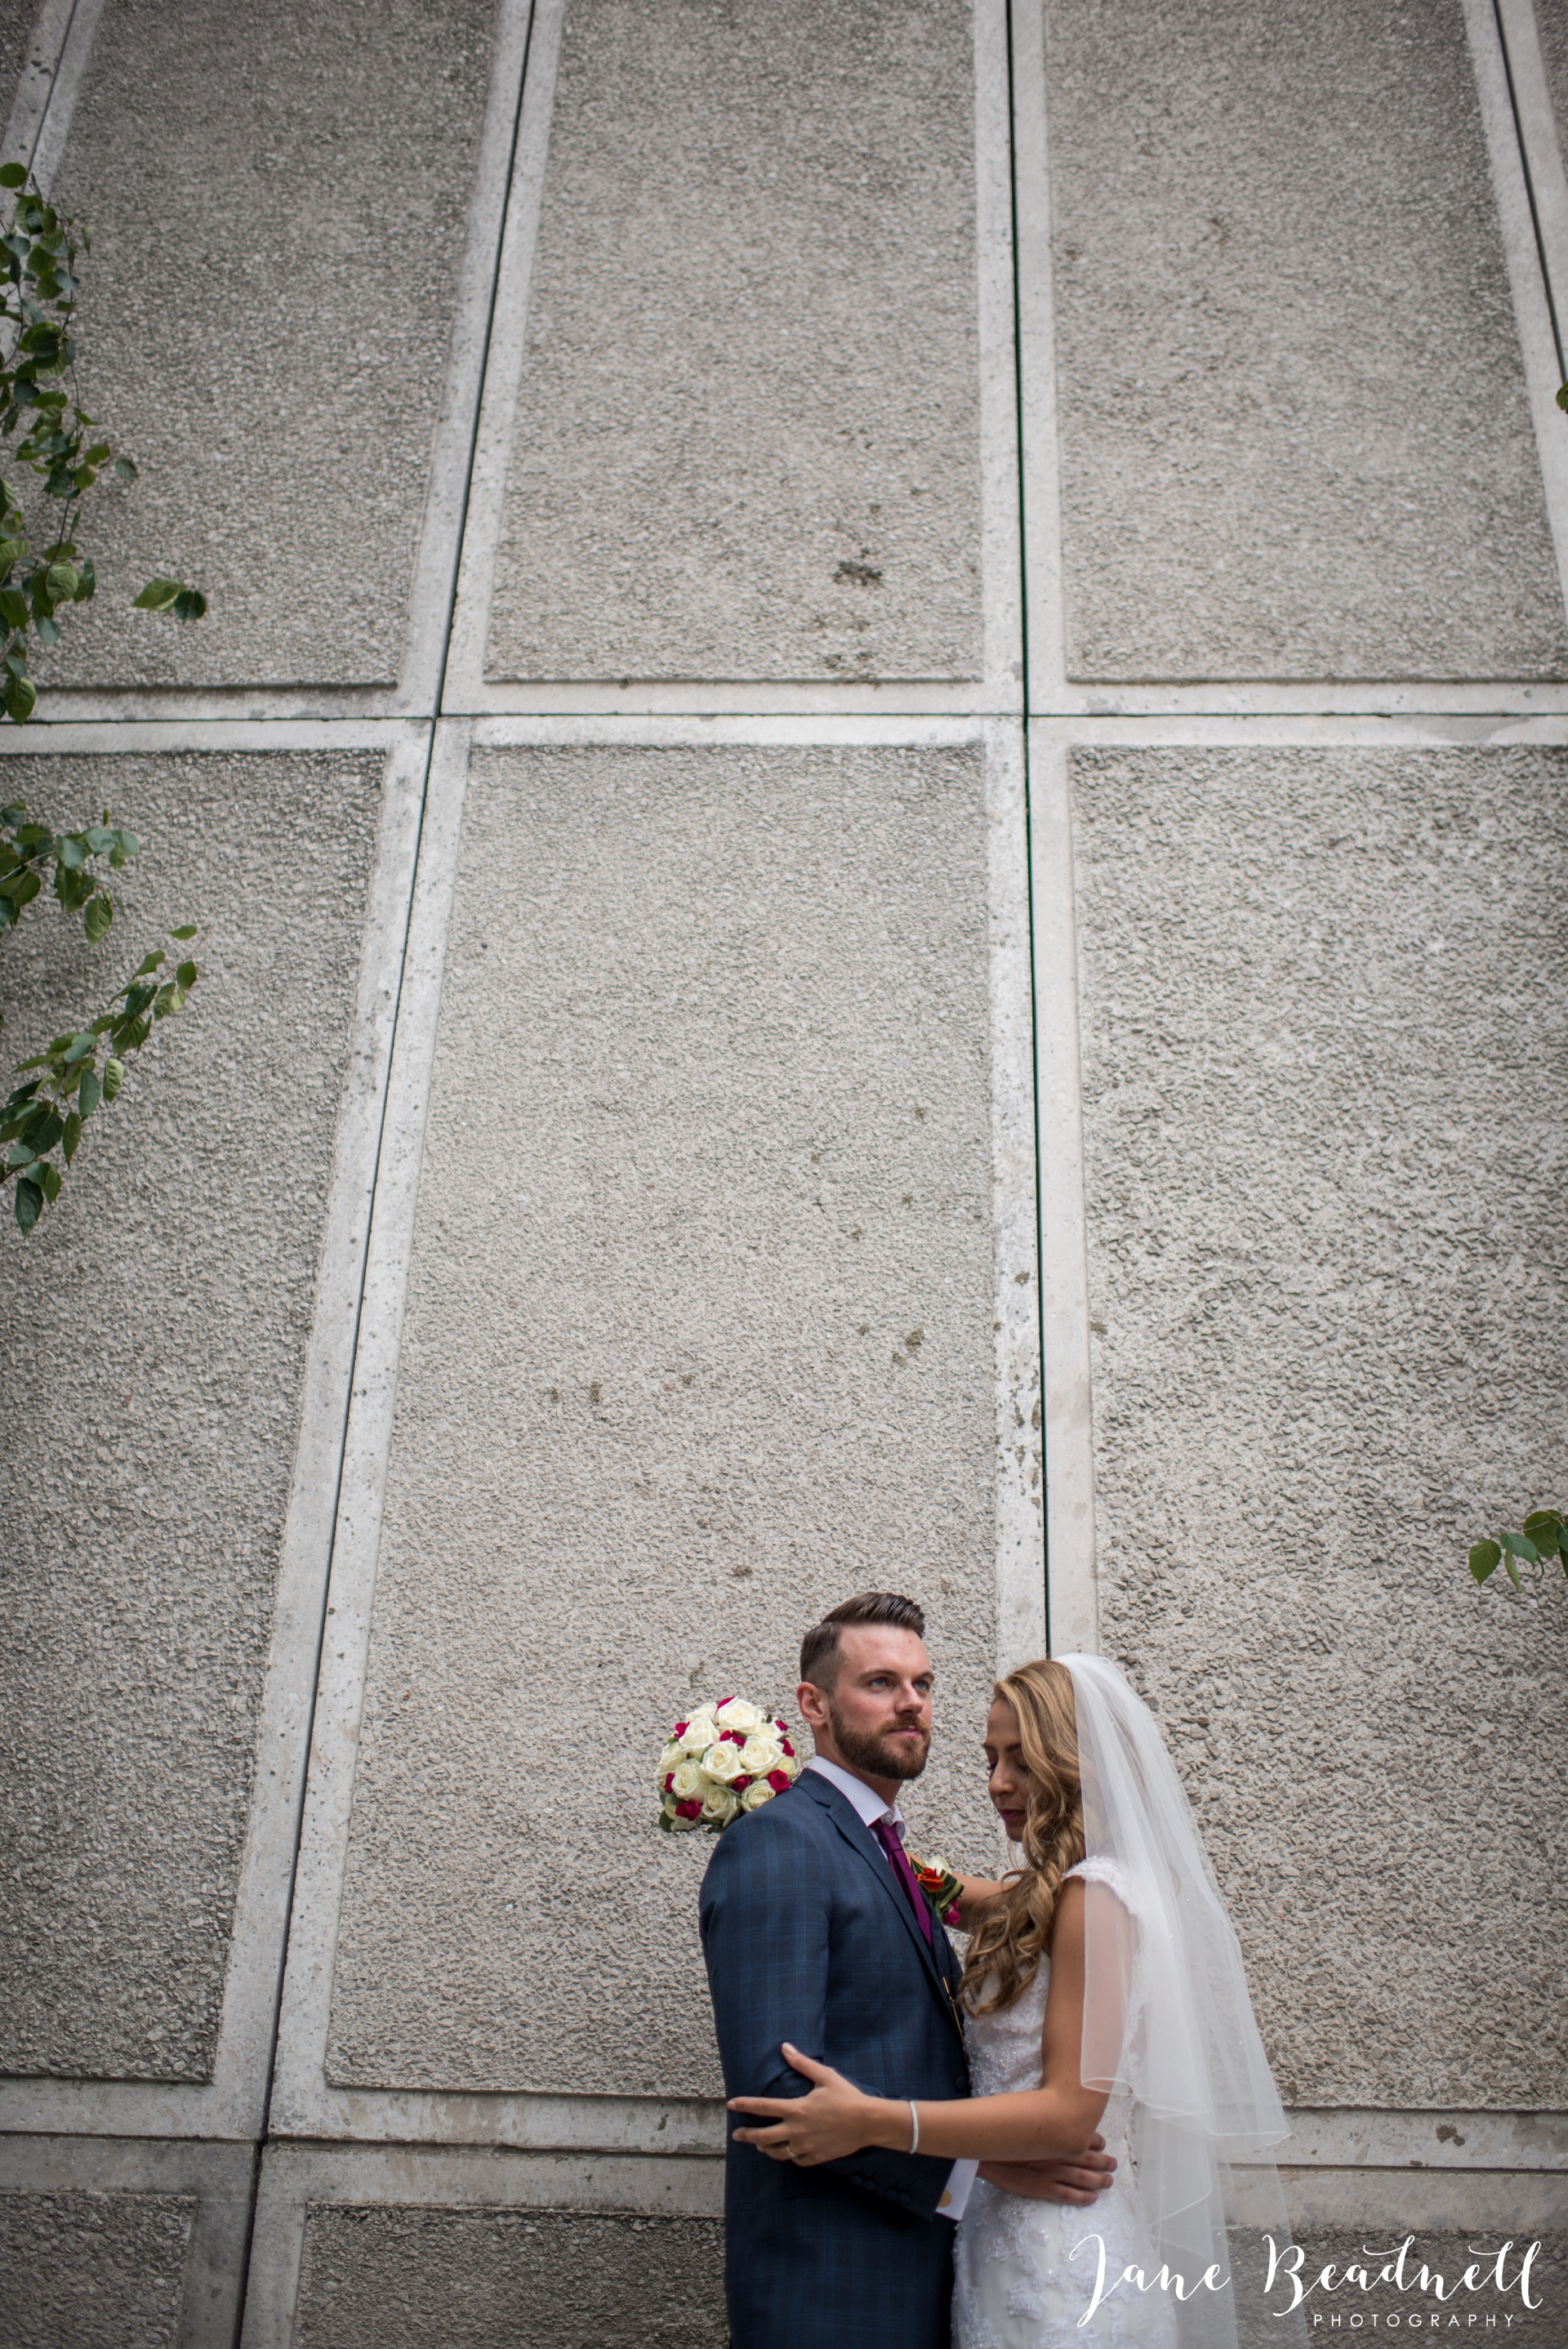 Jane Beadnell fine art wedding photographer Harrogate_0016